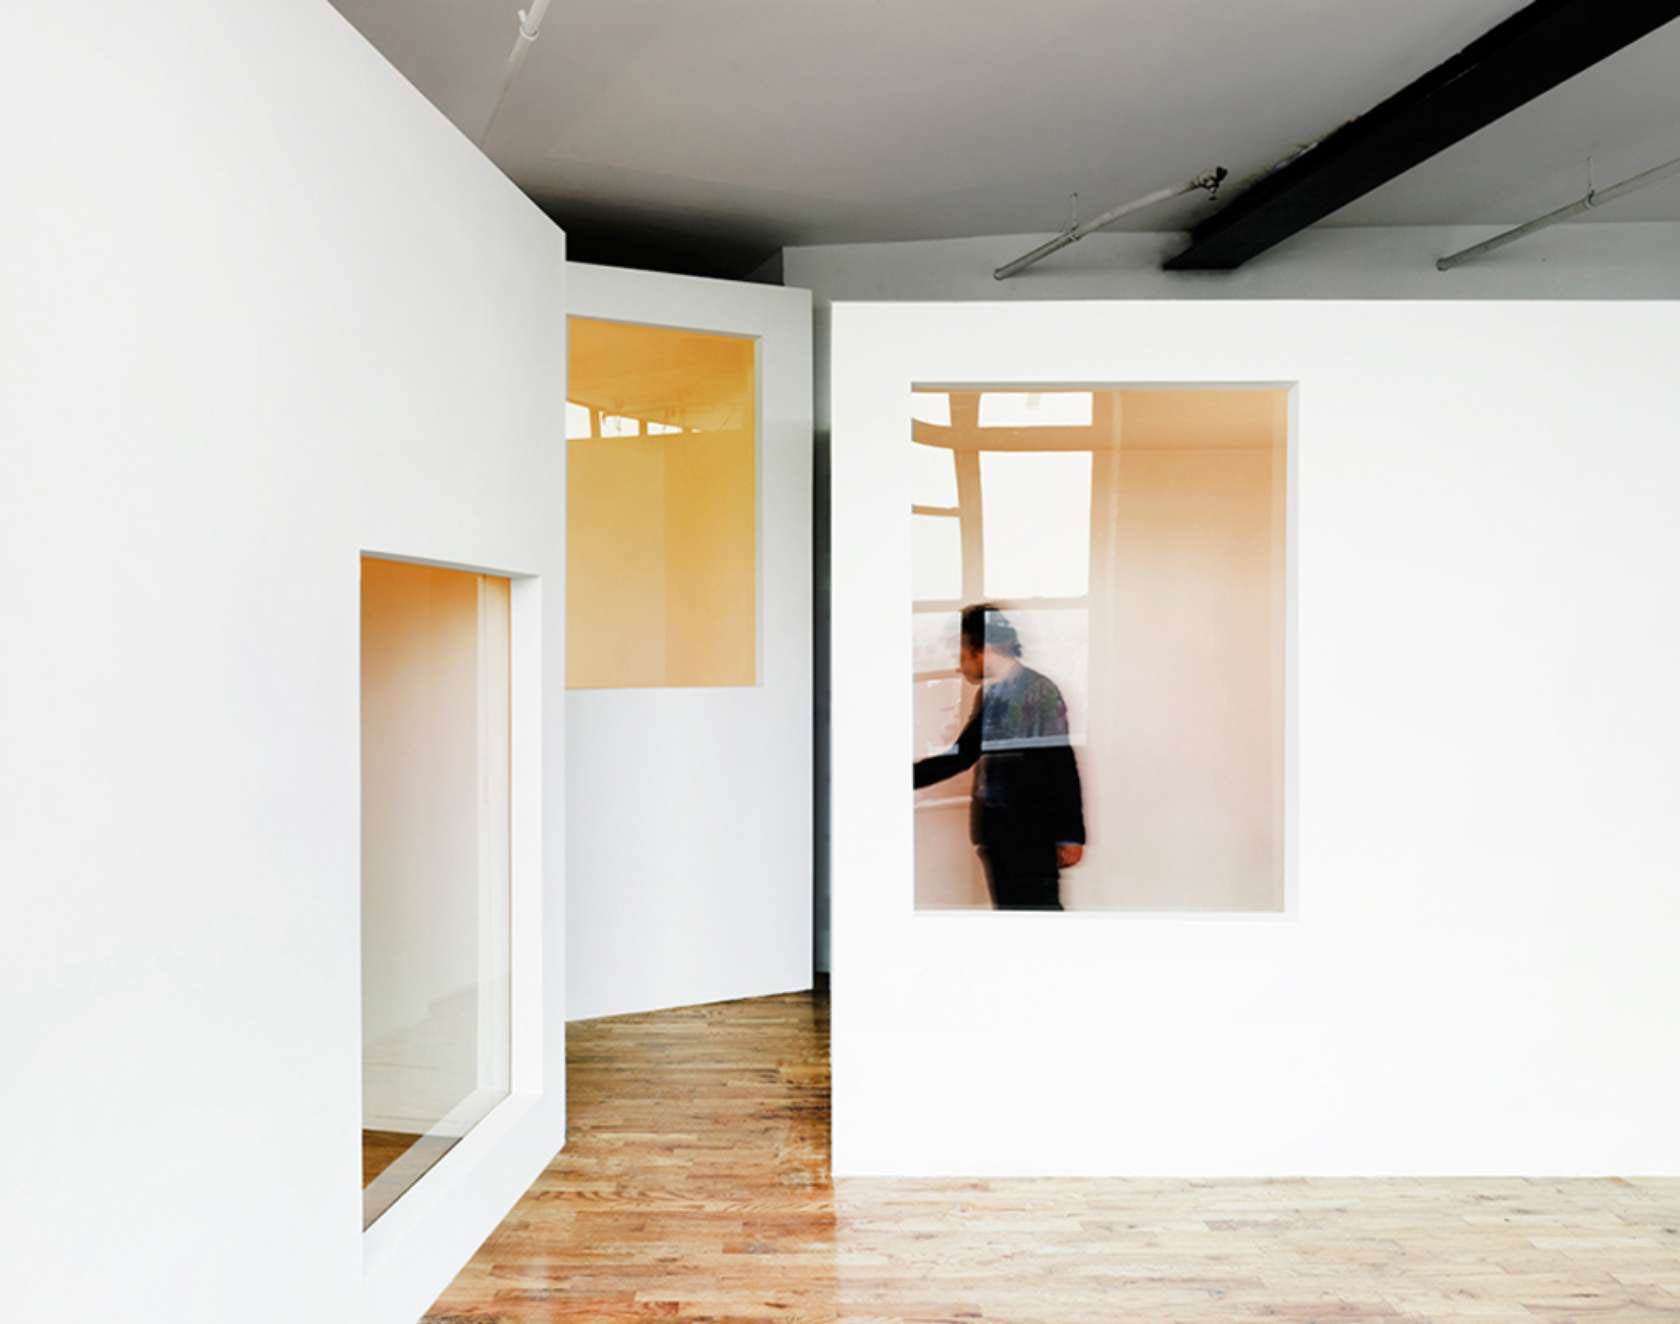 Studio Cadena Transforms Awkward 600 sq ft Bushwick Loft into Airy ...